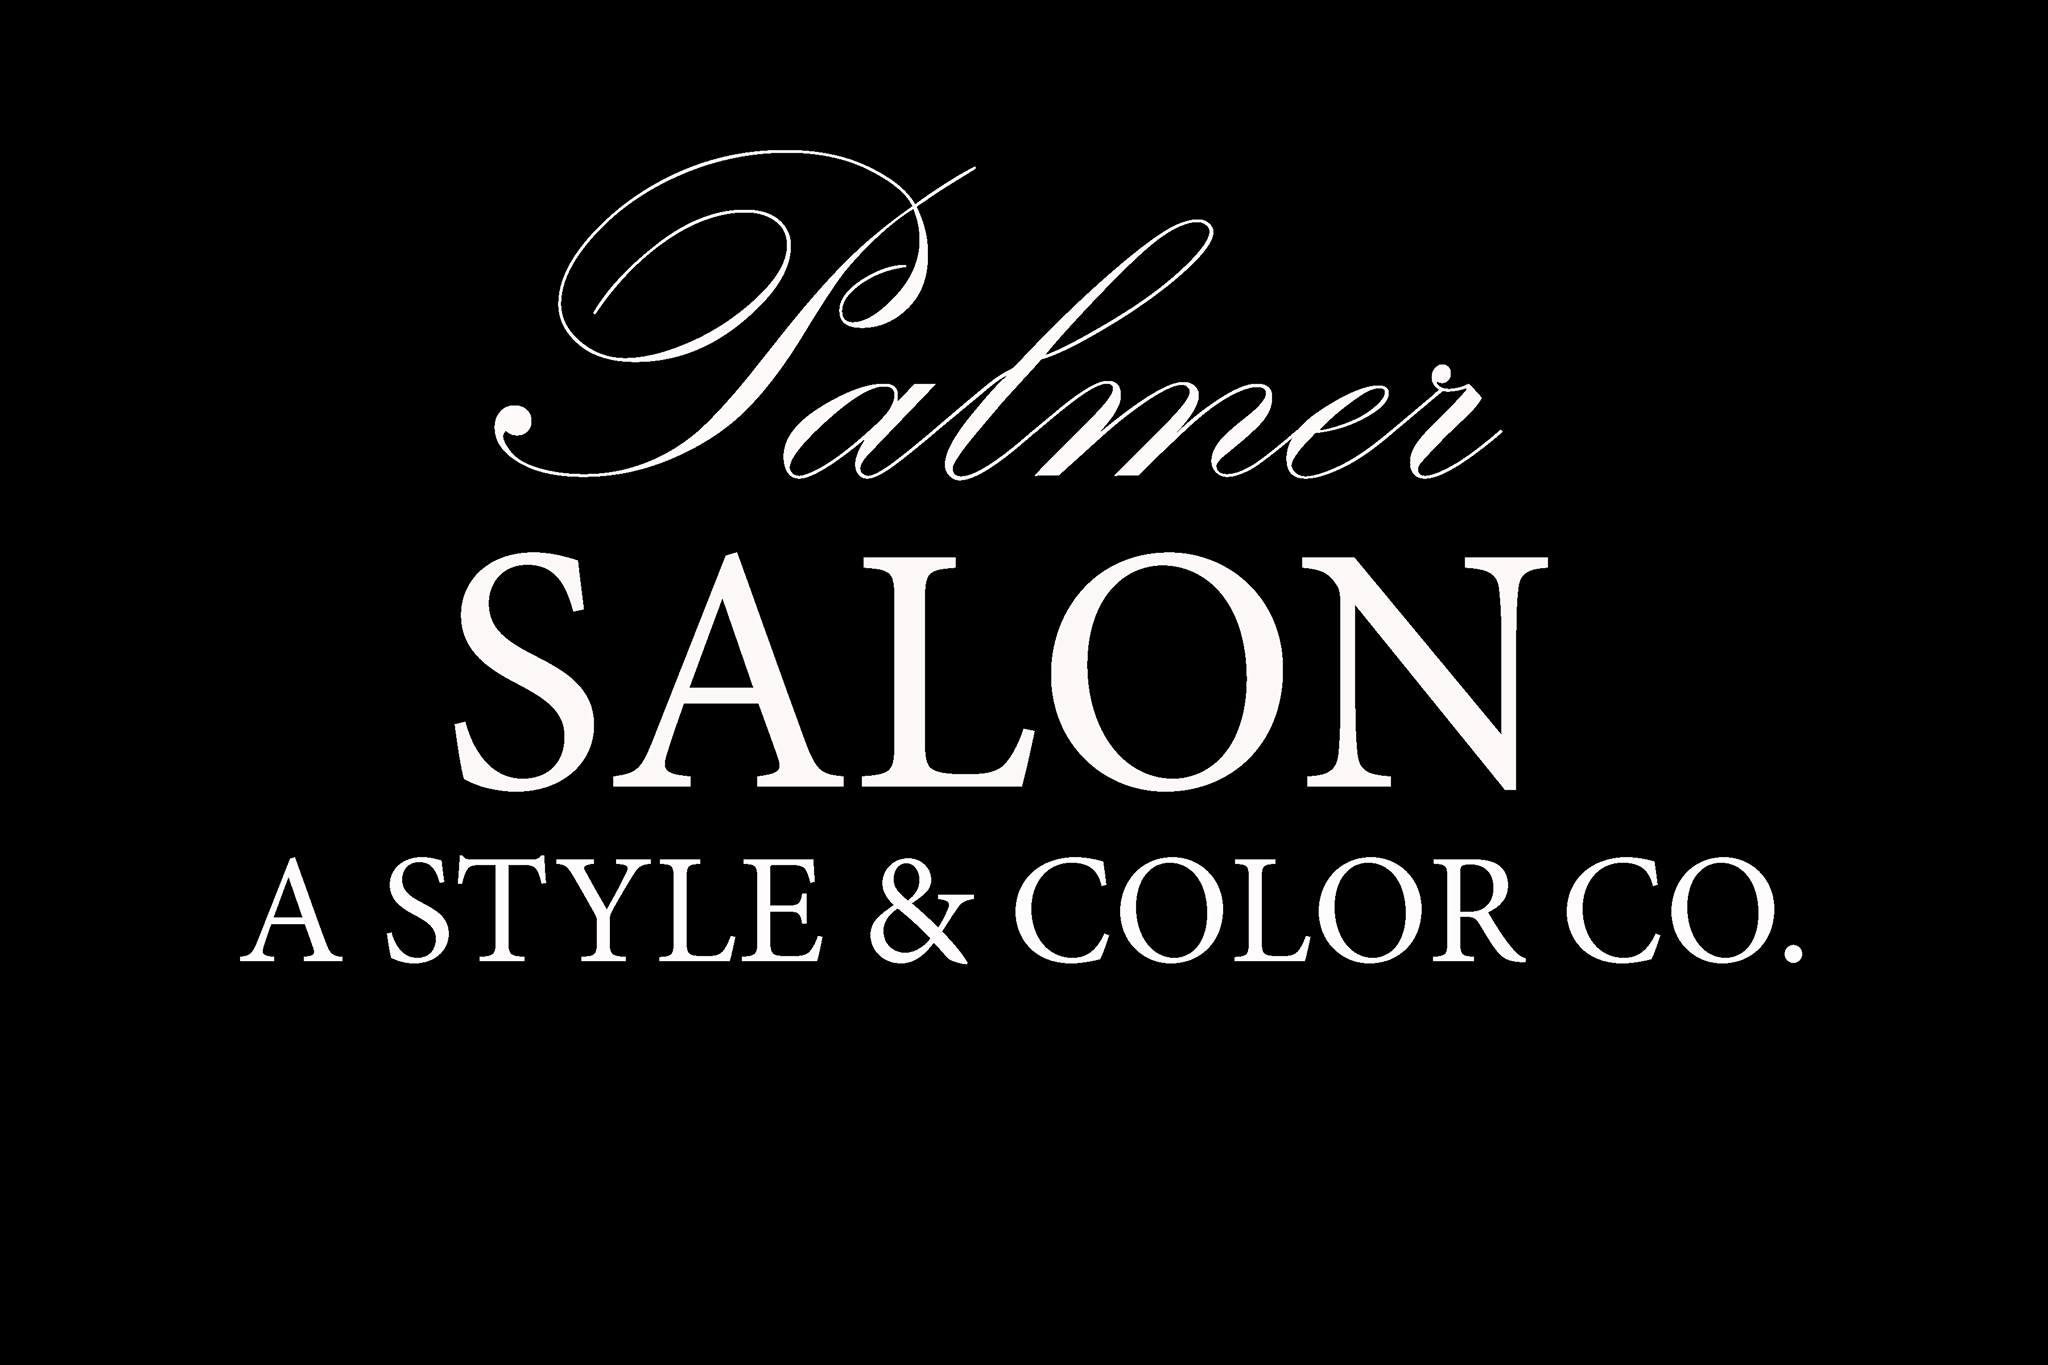 PALMER SALON A STYLE & COLOR CO.